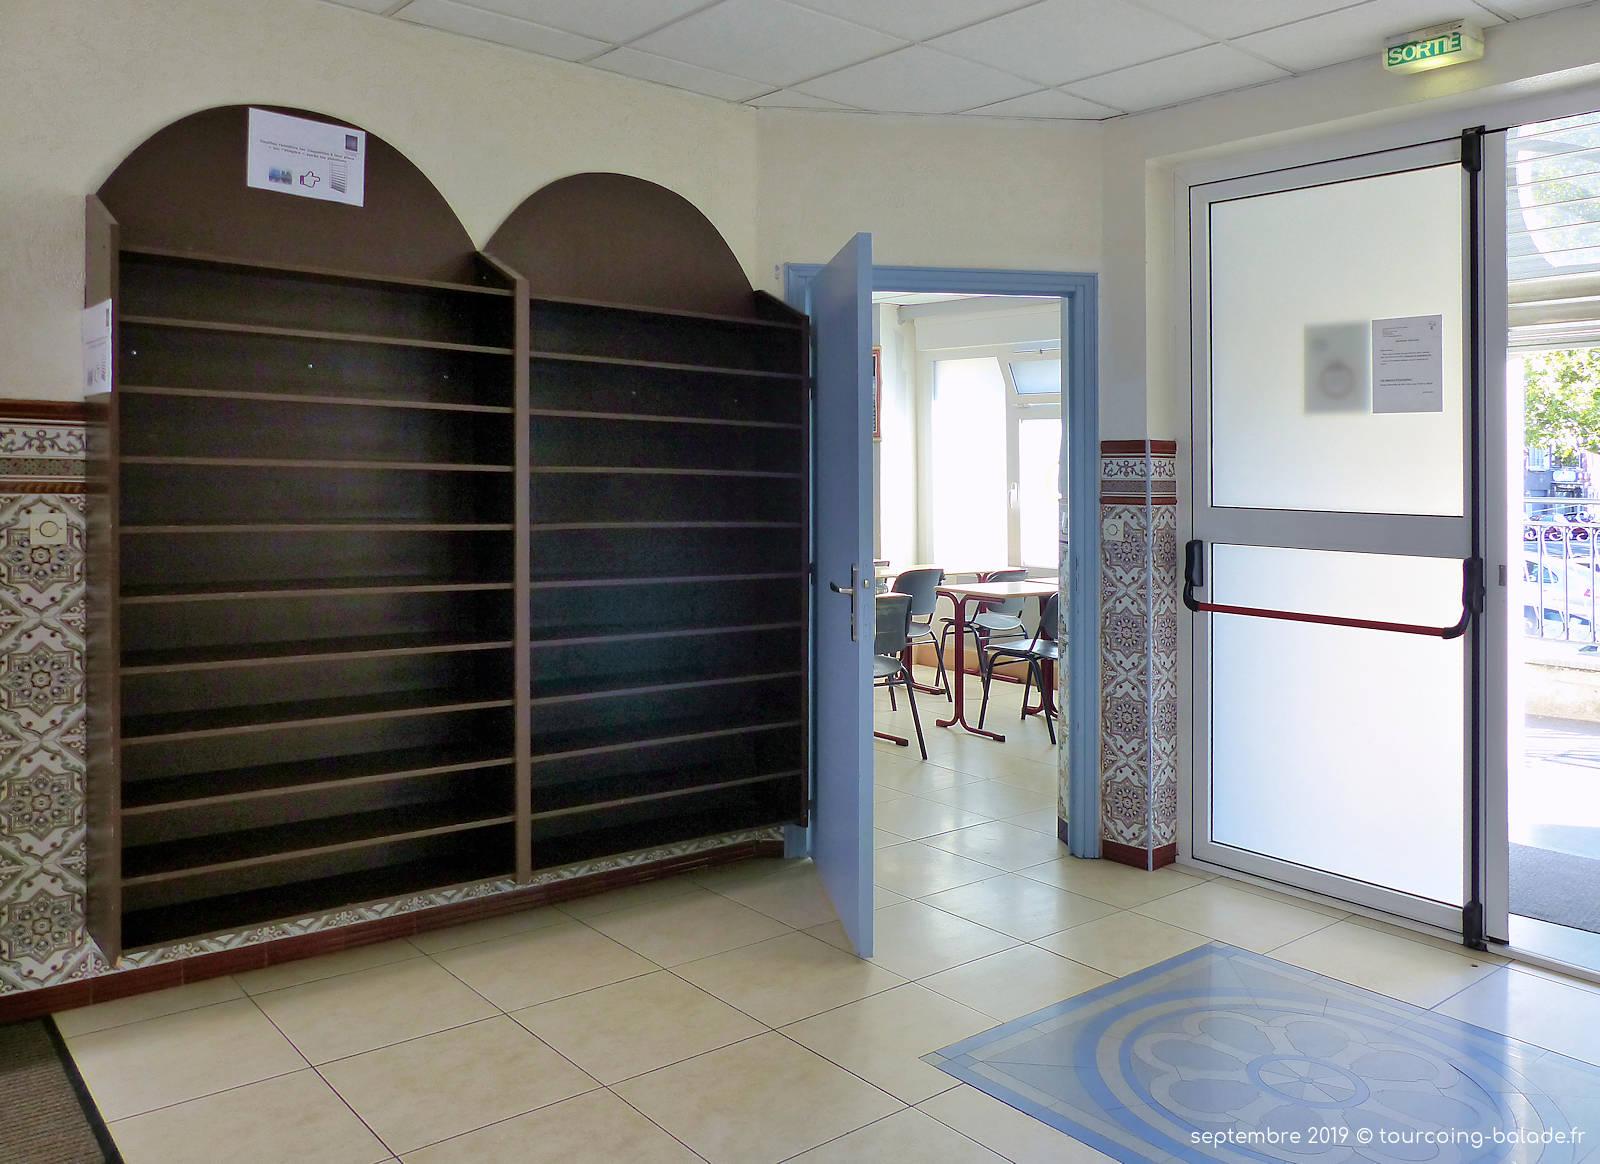 Mosquée Assalam Tourcoing - Entrée, Chaussures.